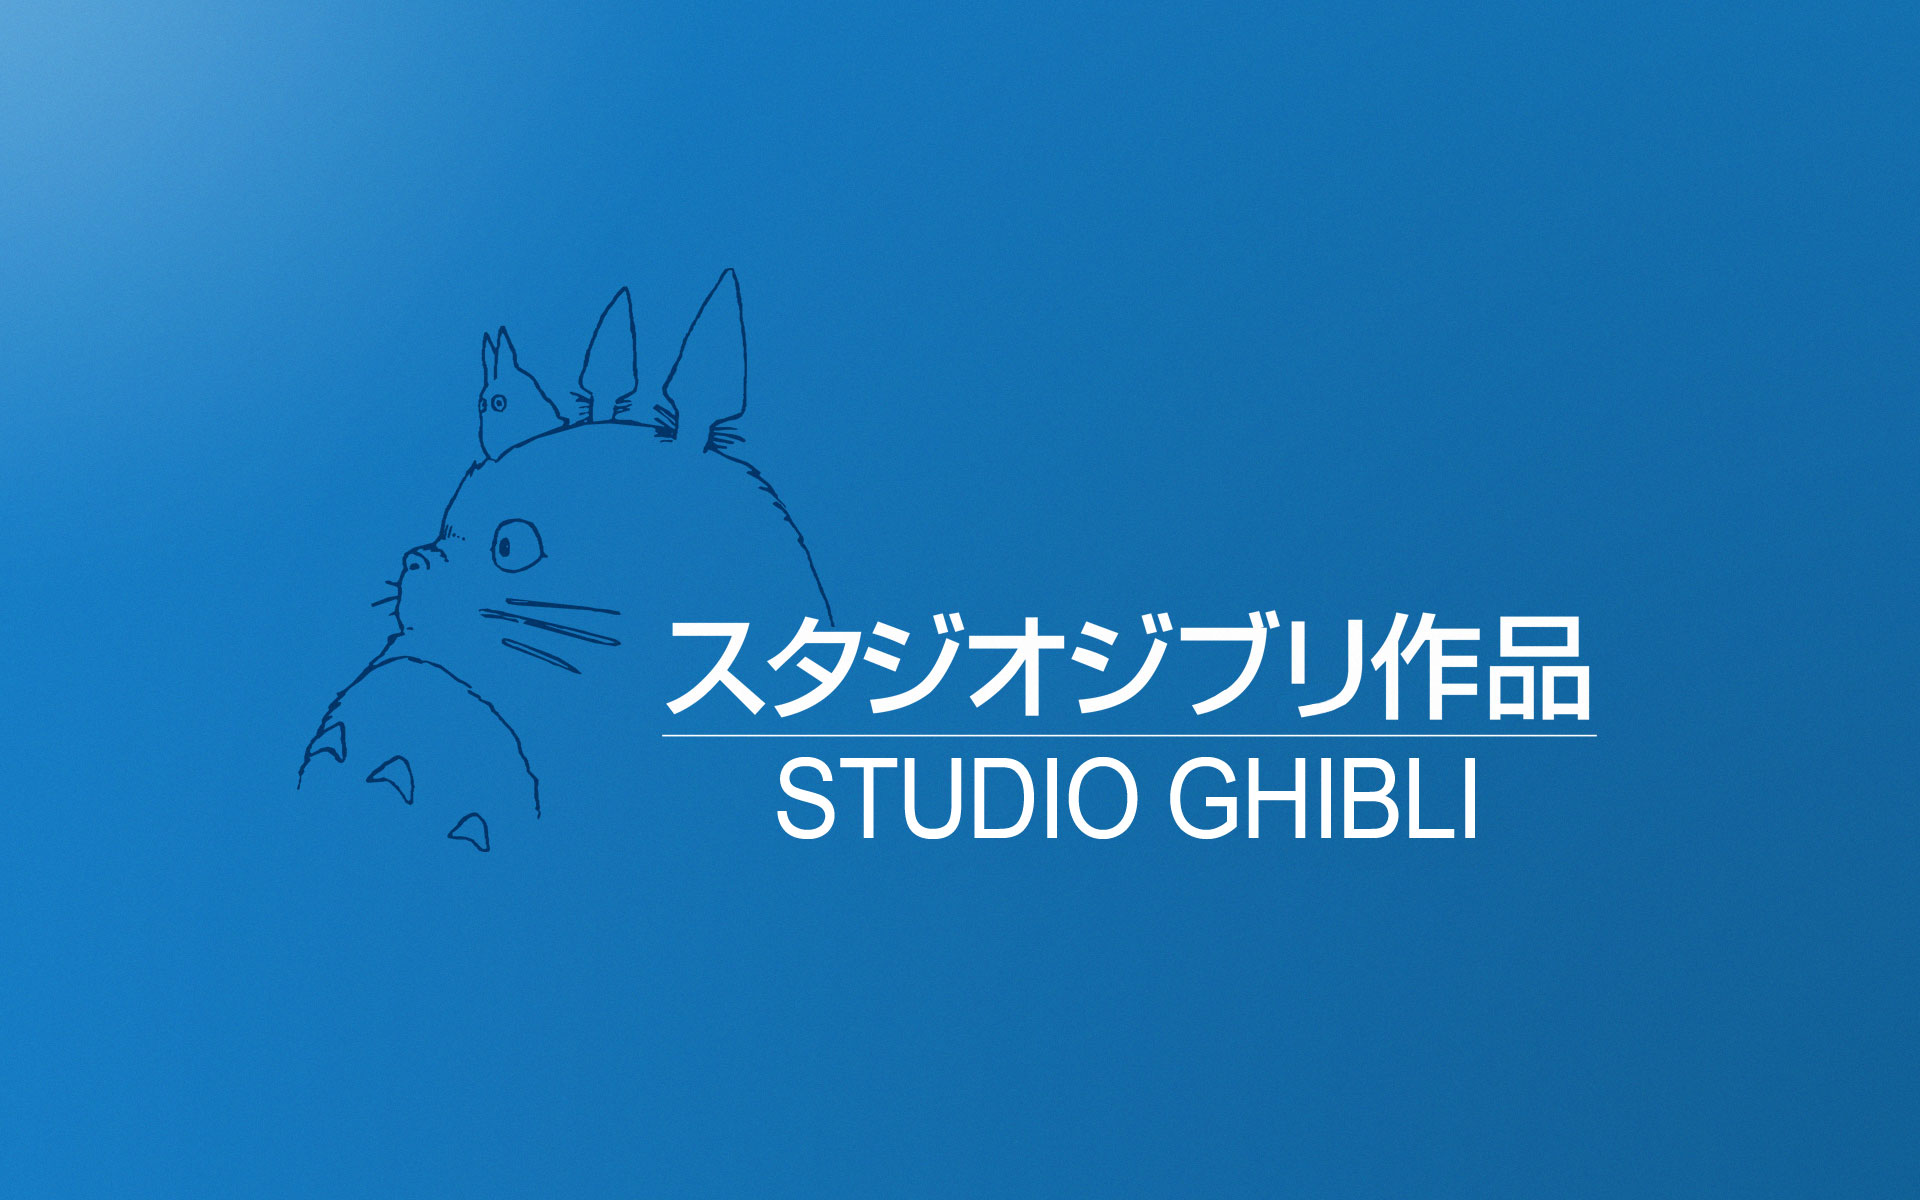 Studio Ghibli Wallpaper 1920x1200